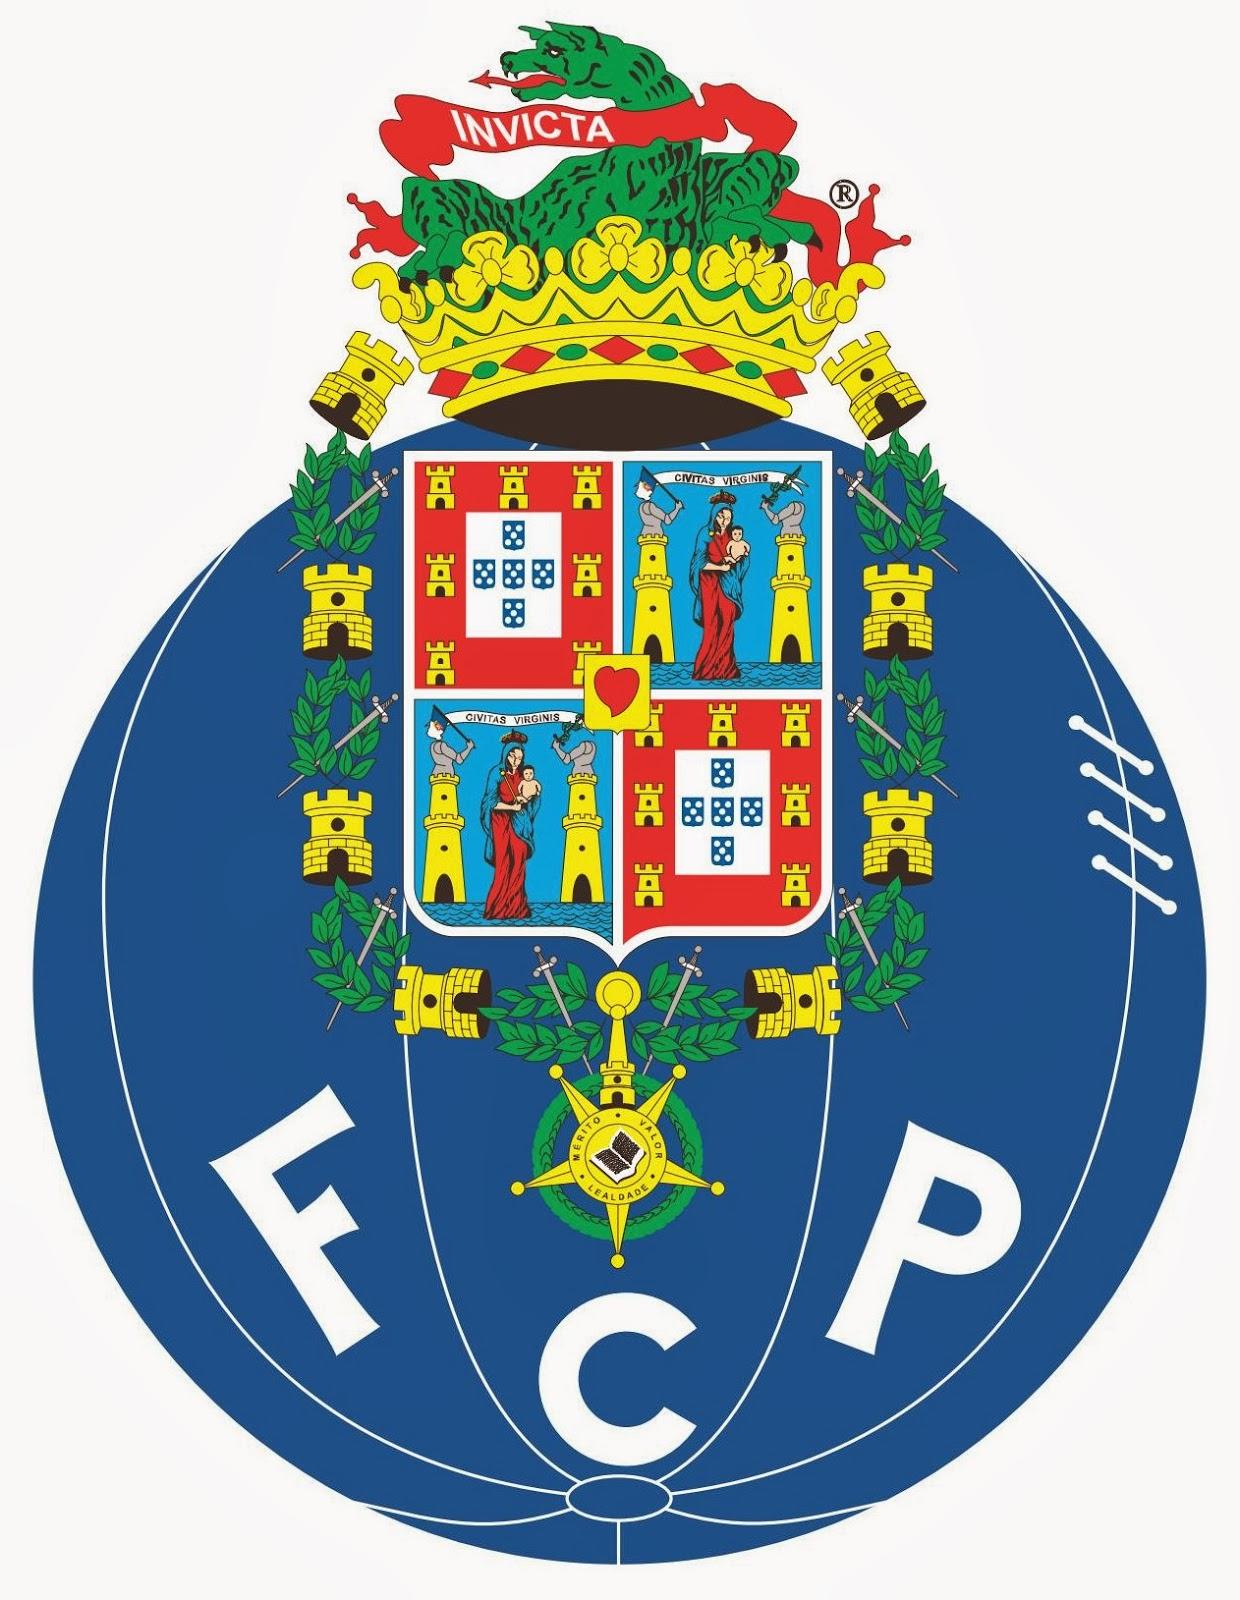 Barcelona sporting club vs cobreloa online dating 10